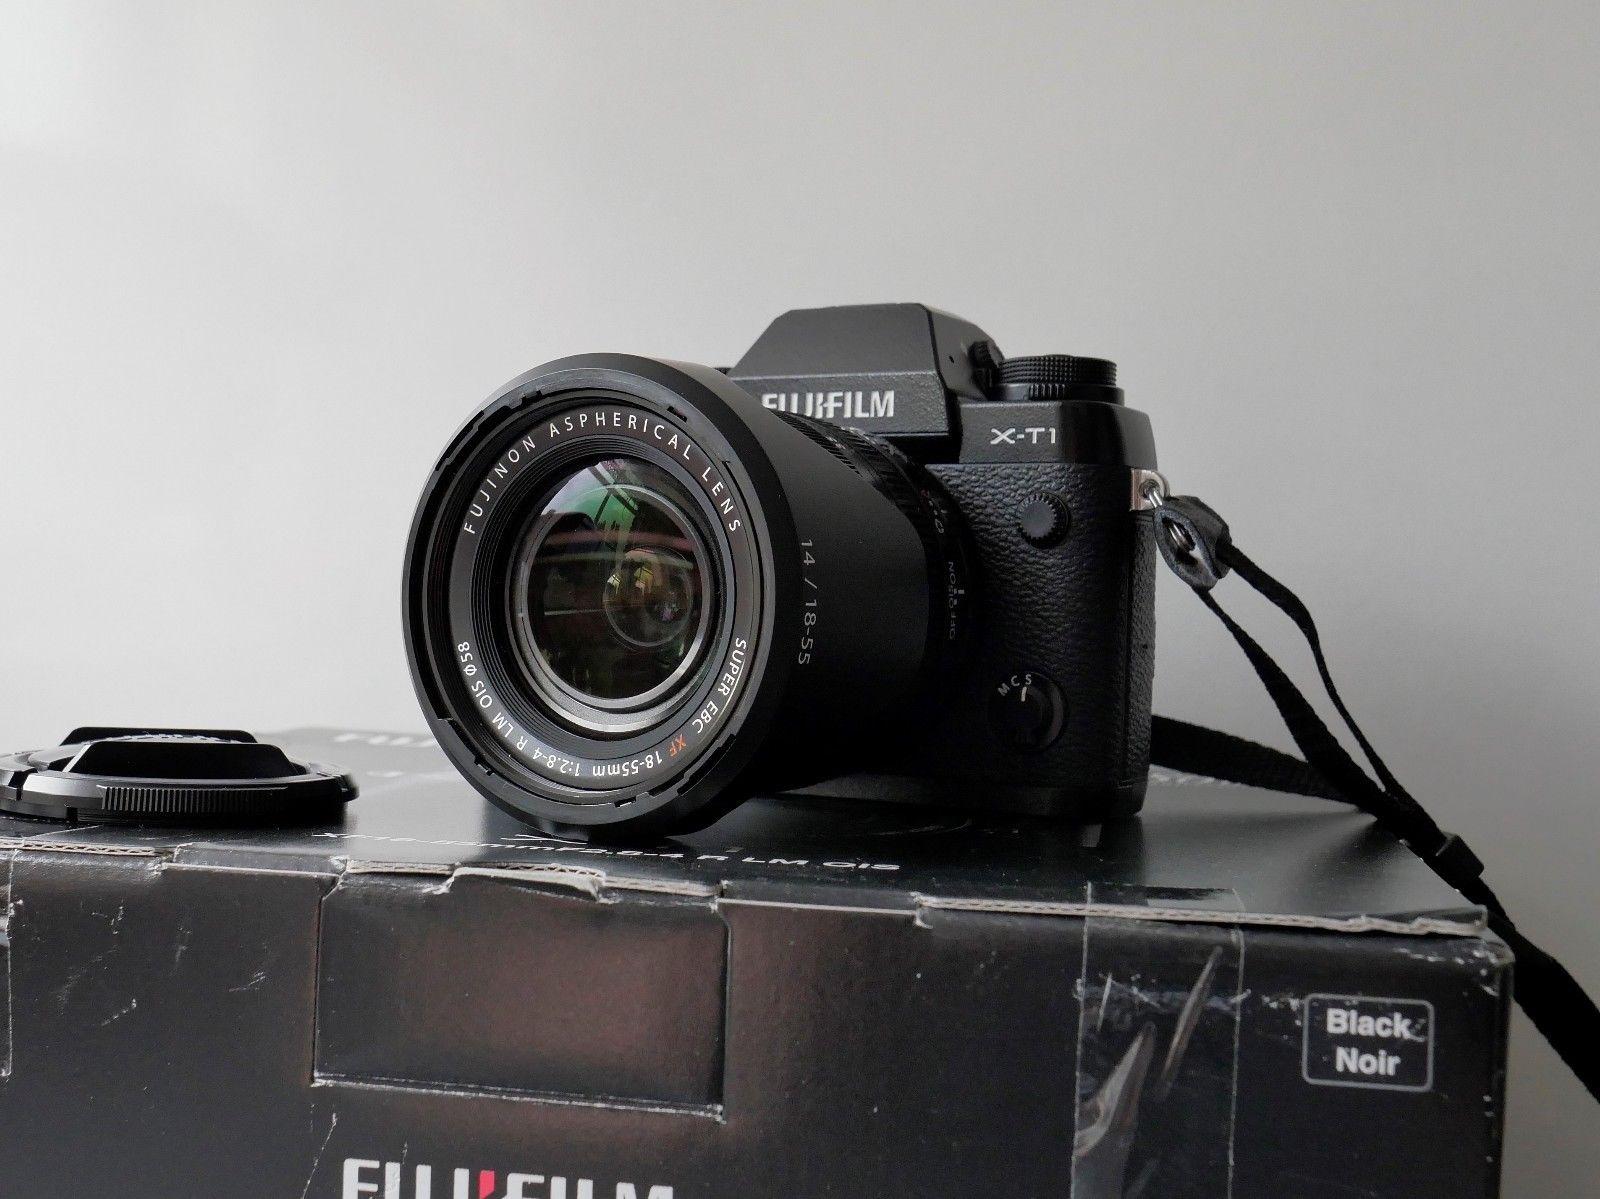 Fujifilm X-T1 16.3 MP - Schwarz (Kit mit  XF 18-55mm f/2.8-4.0 OIS) neuwertig